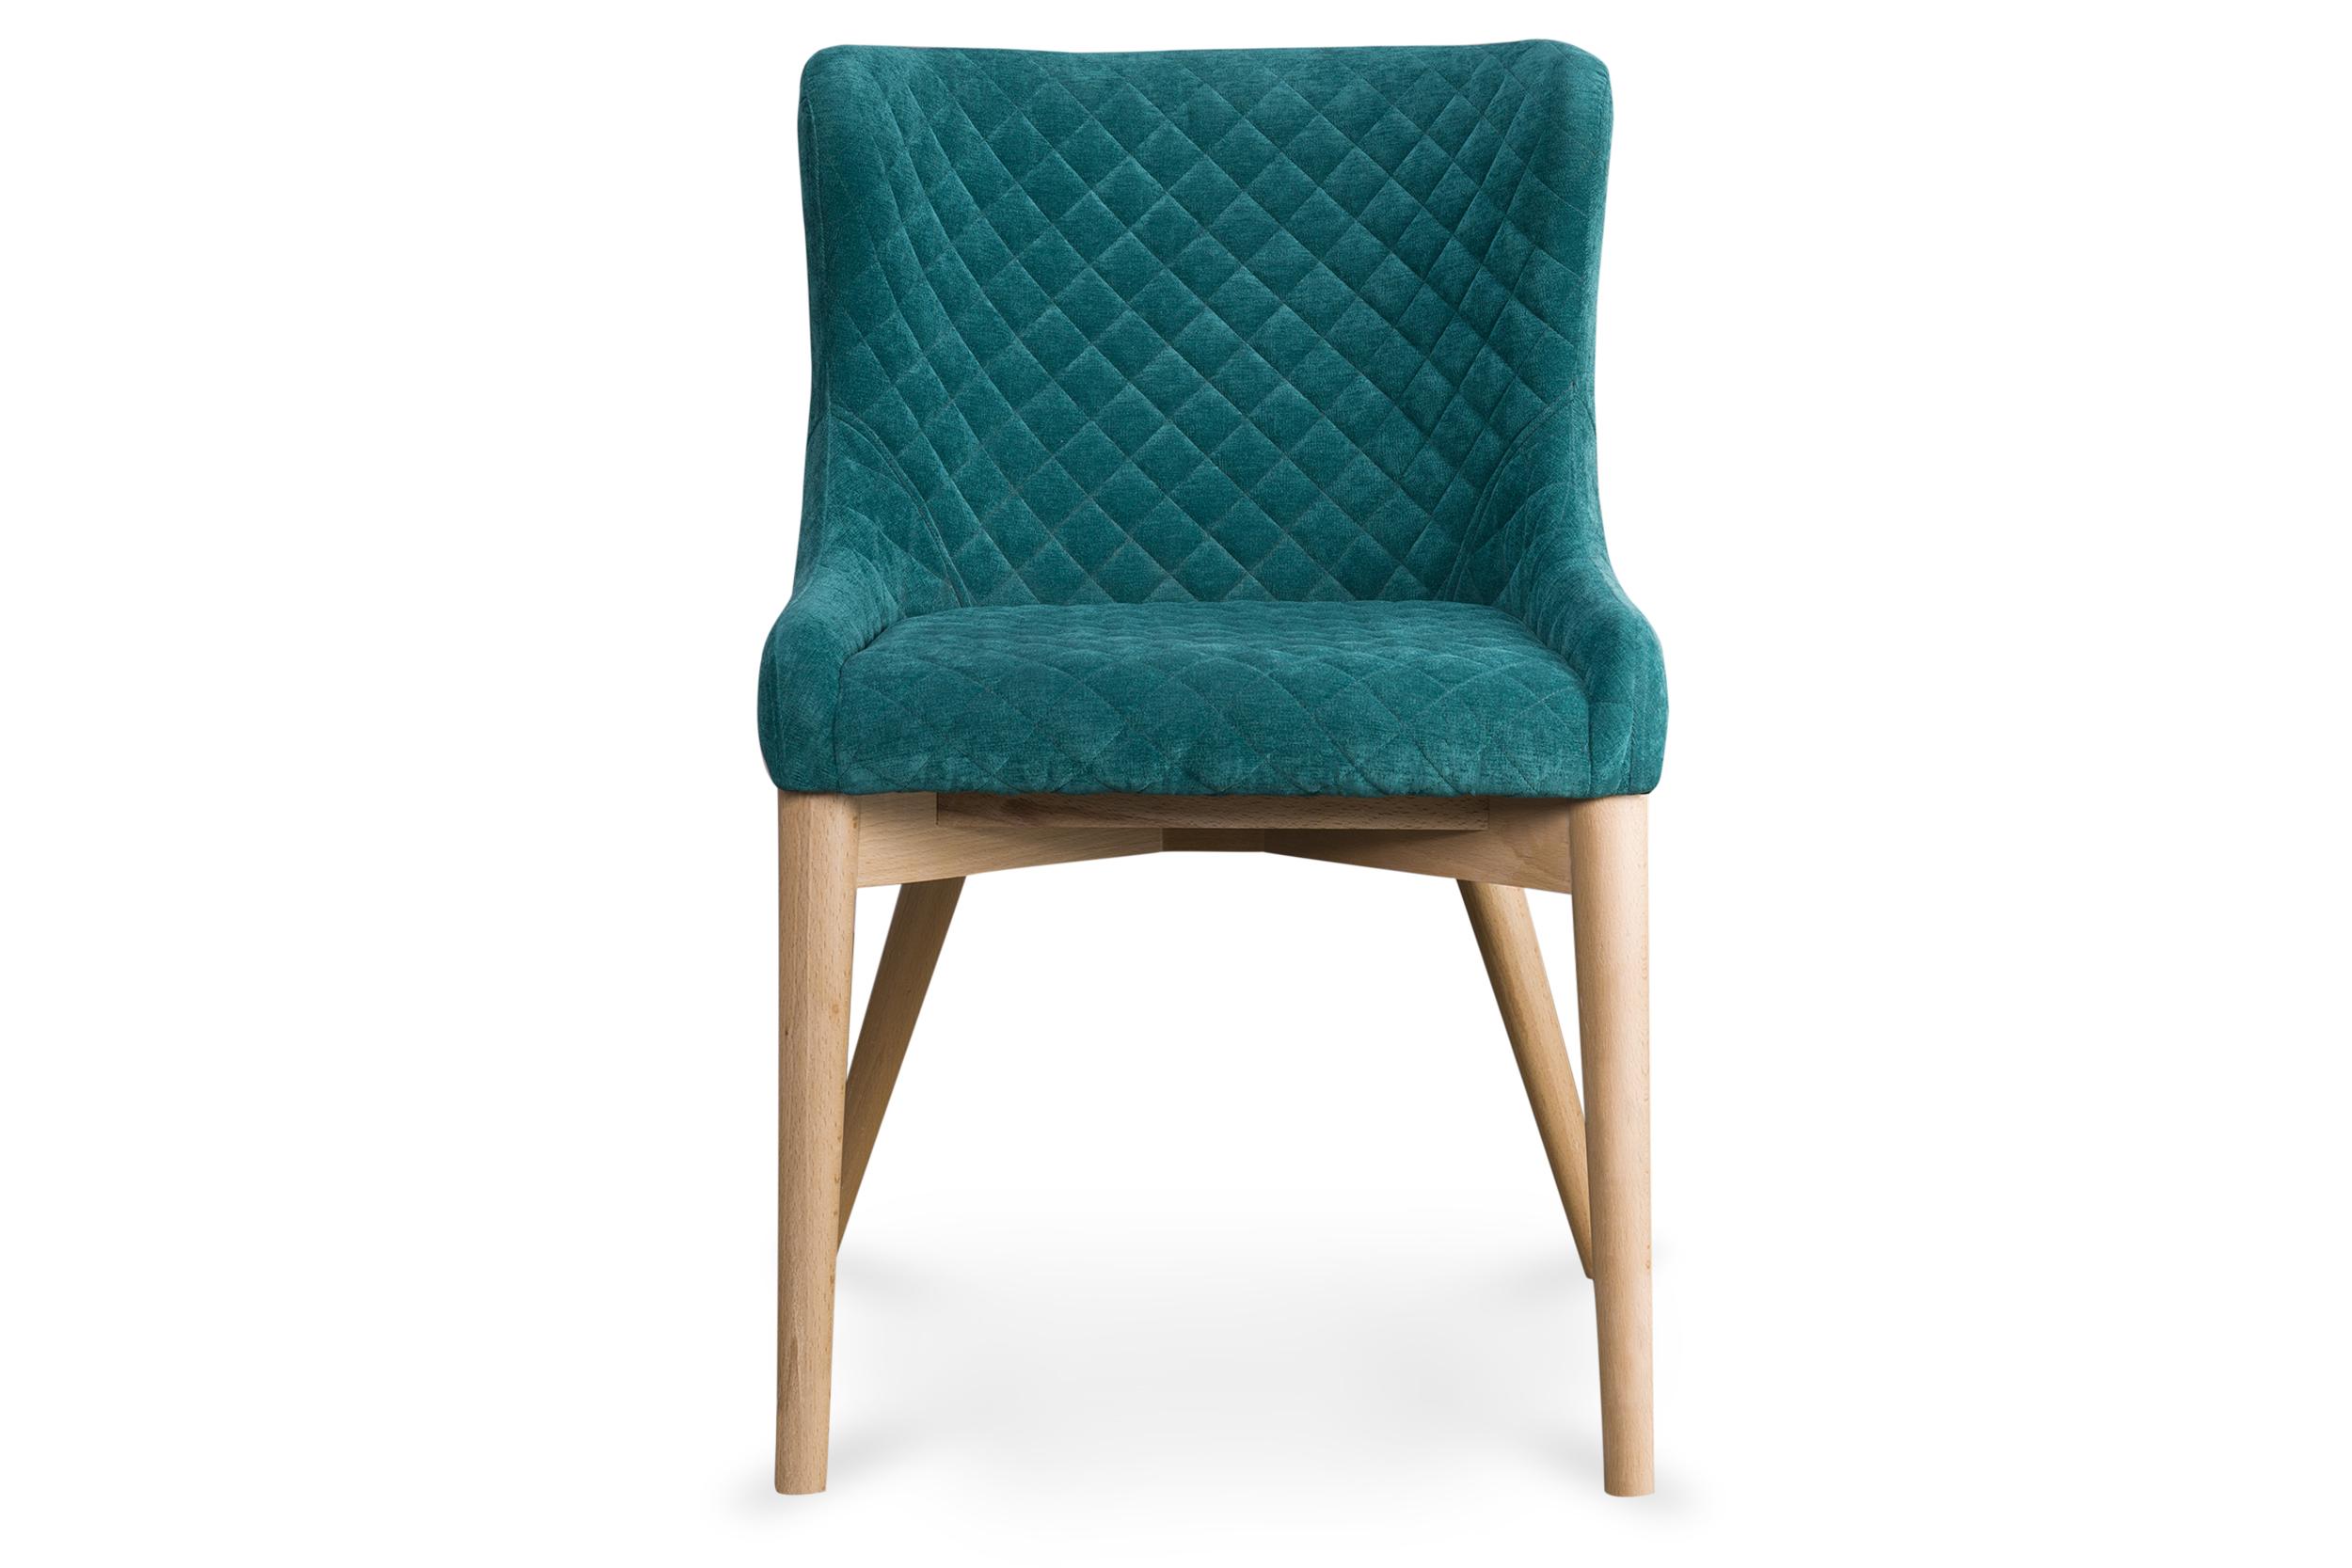 Кухонный стул MyFurnish 15433462 от thefurnish